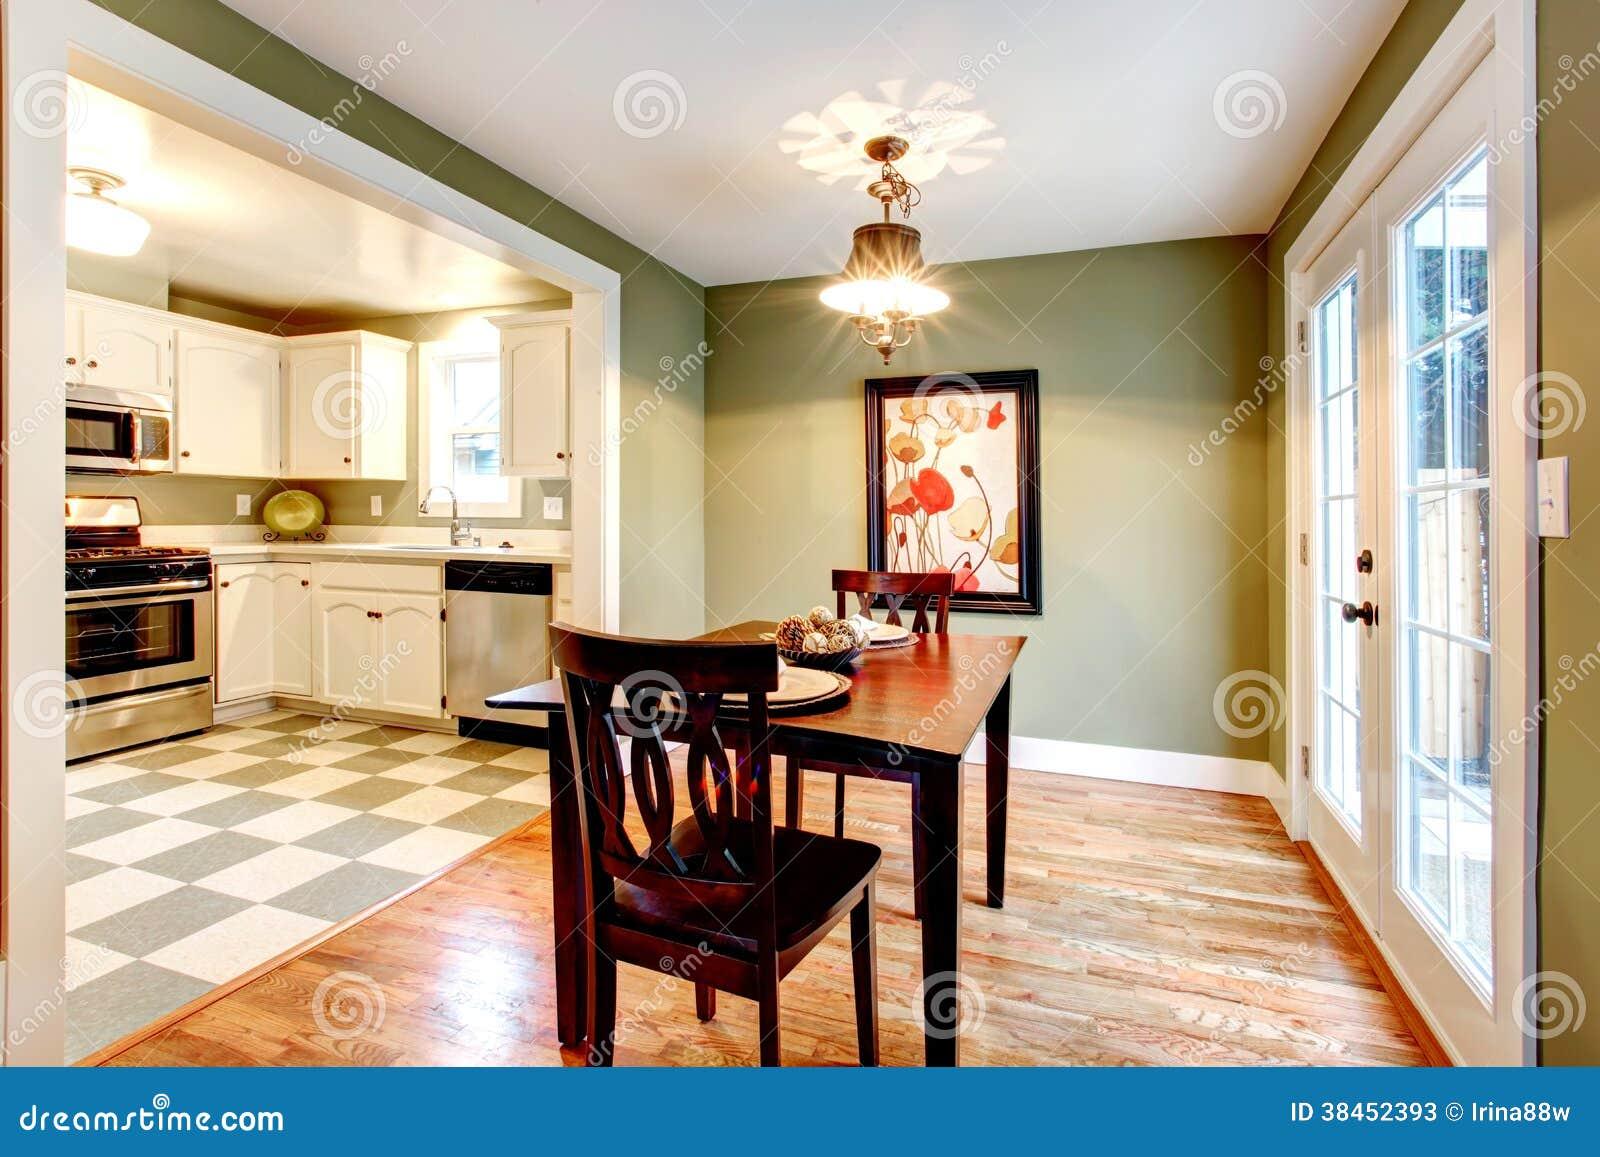 Cucina Con Parete Verde : Cucina con parete verde. Cucina bianca ...